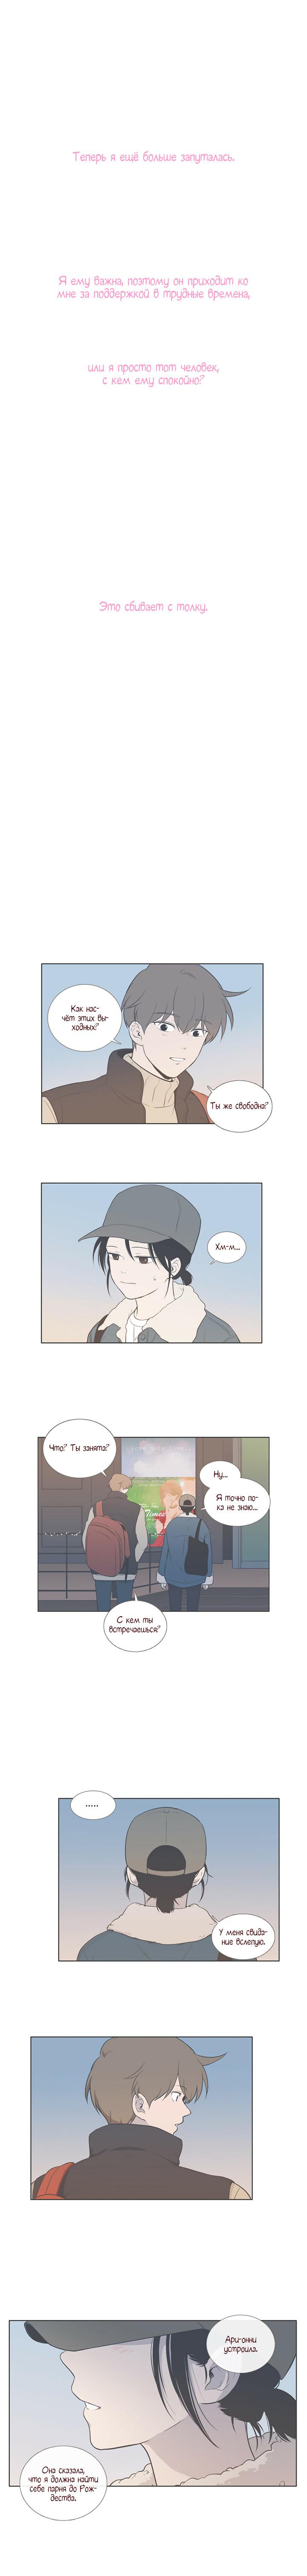 https://r1.ninemanga.com/comics/pic2/12/22860/419708/1534422452608.jpg Page 9